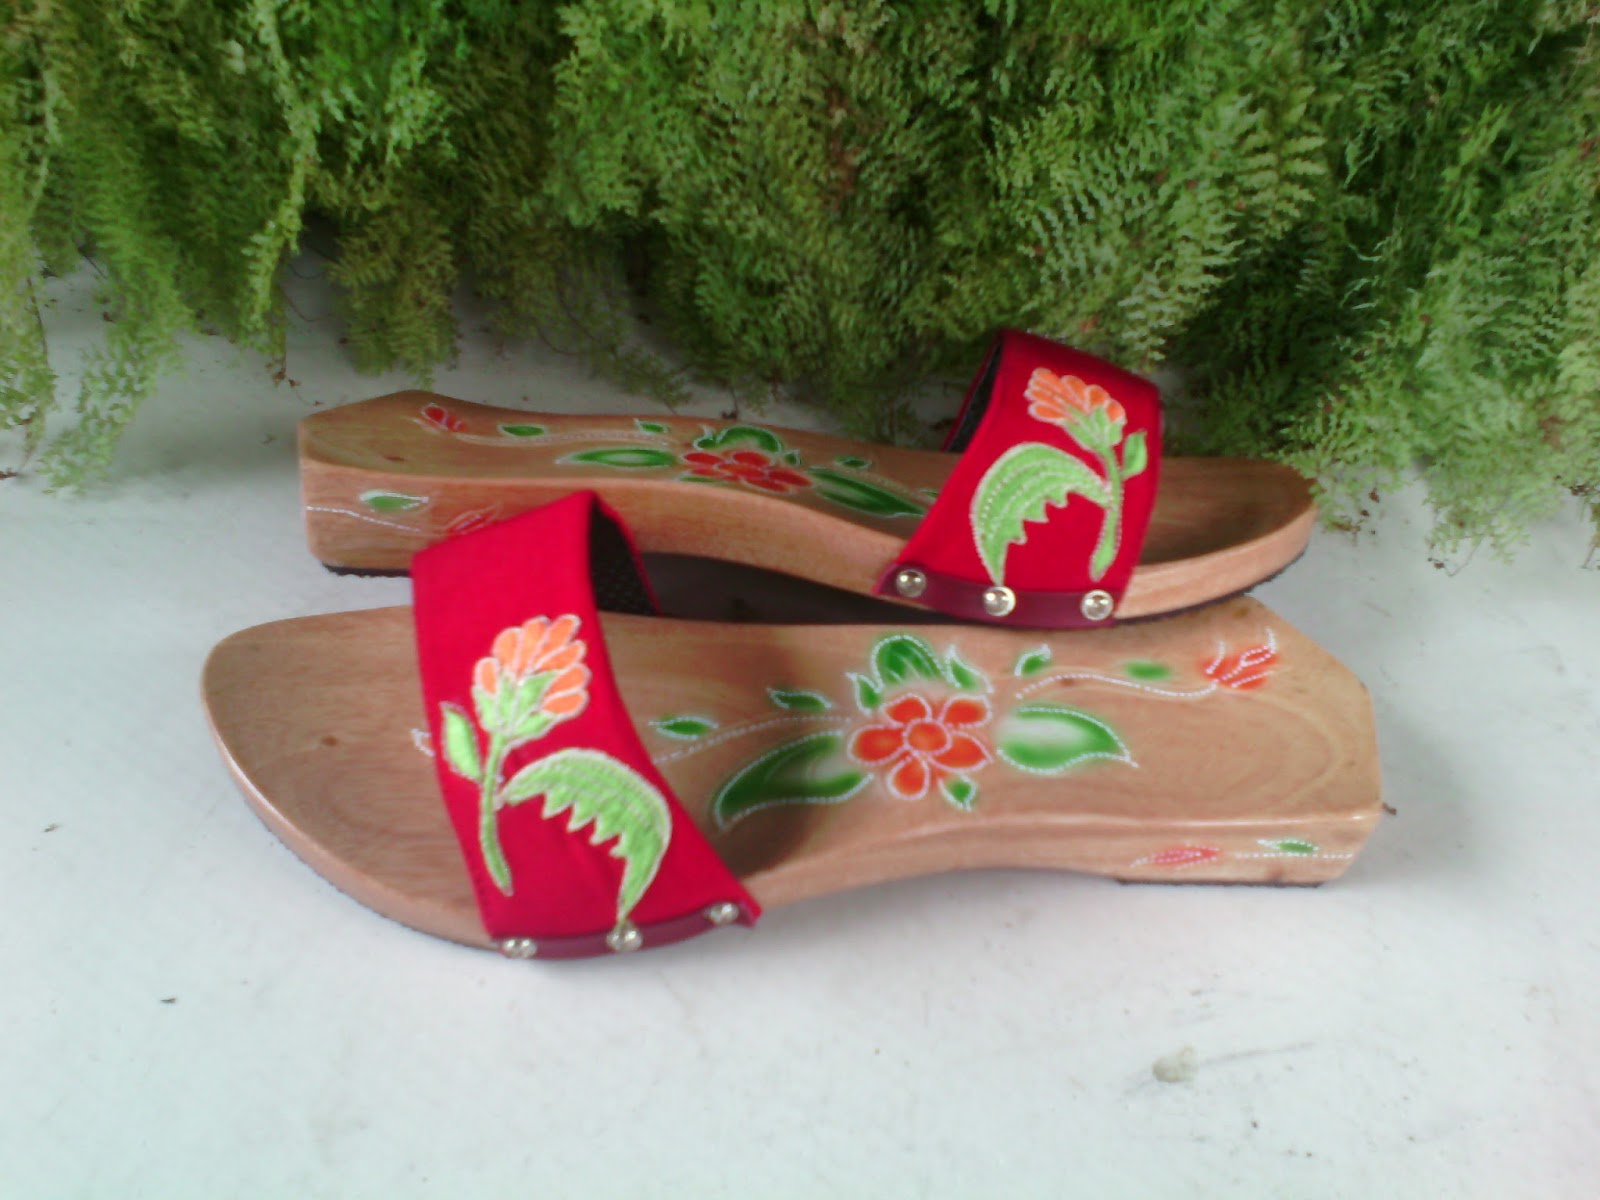 Koleksi Sandal Wanita (Kelom Geulis Tasikmalaya)